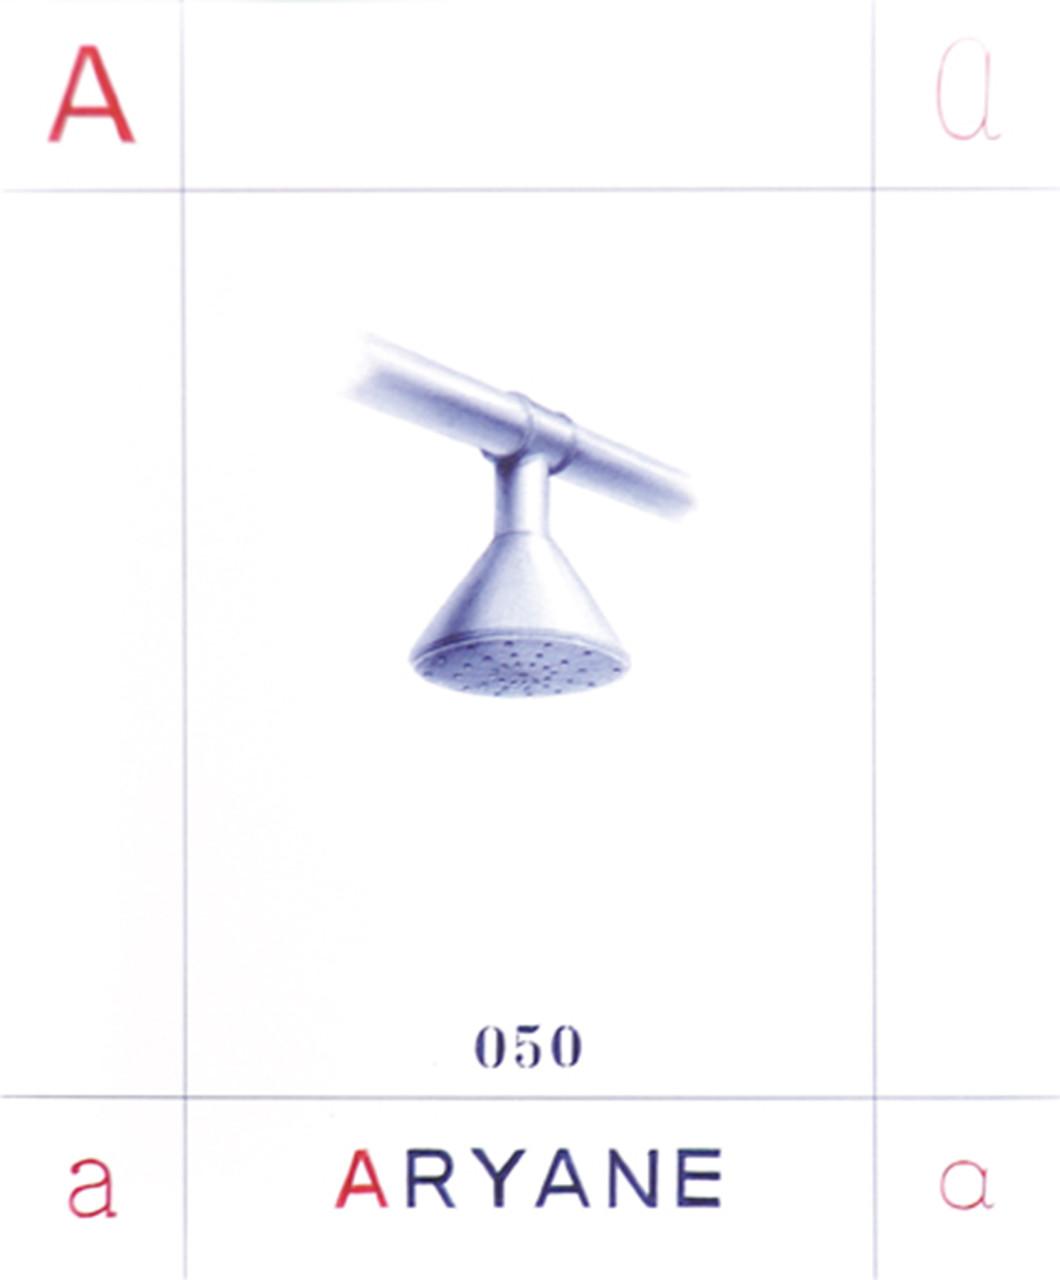 04A-Aryane_bassa